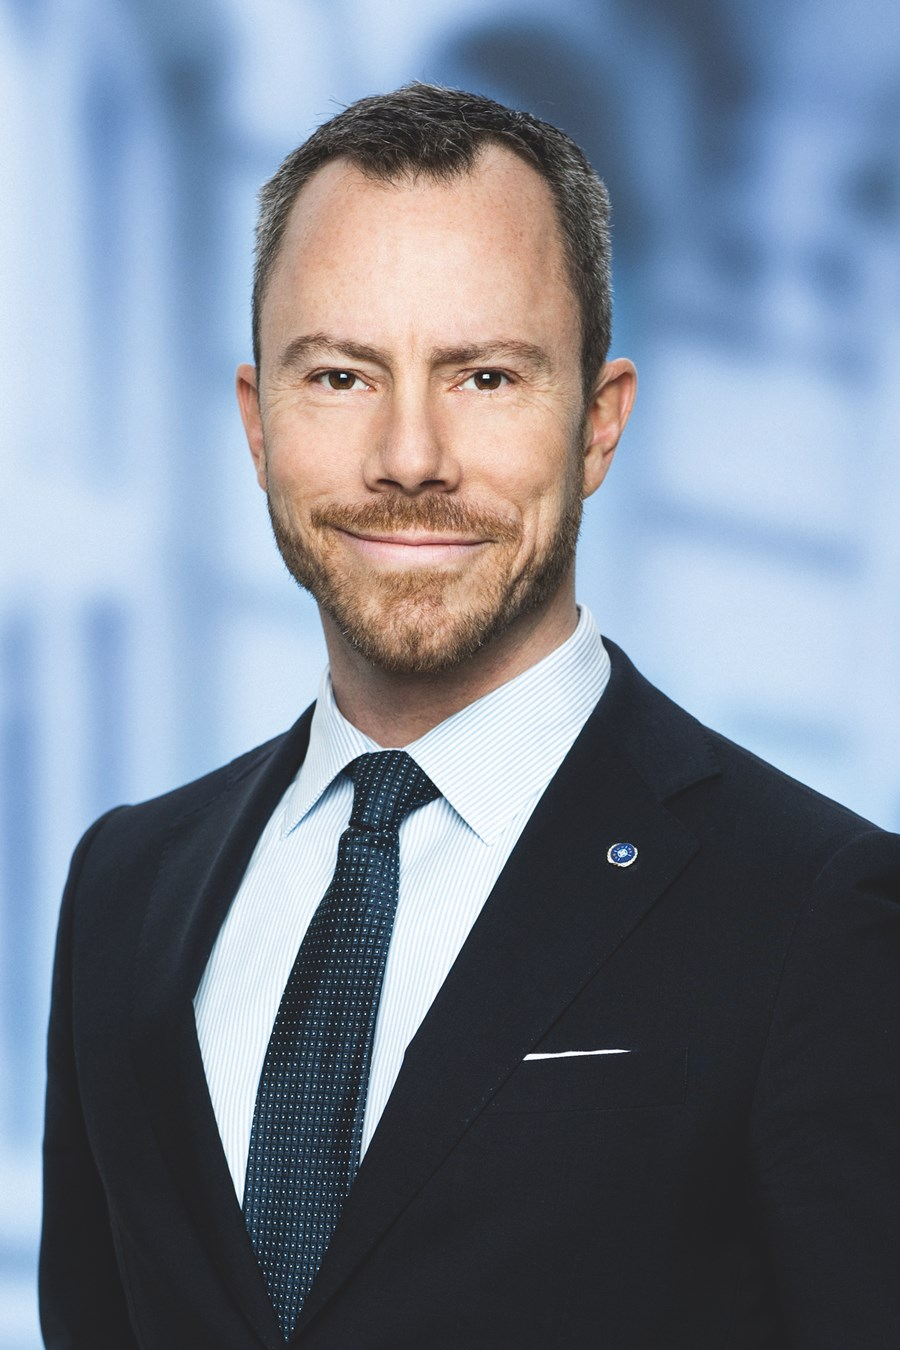 Jakob Ellemann-Jensen - Århus Syd.jpg